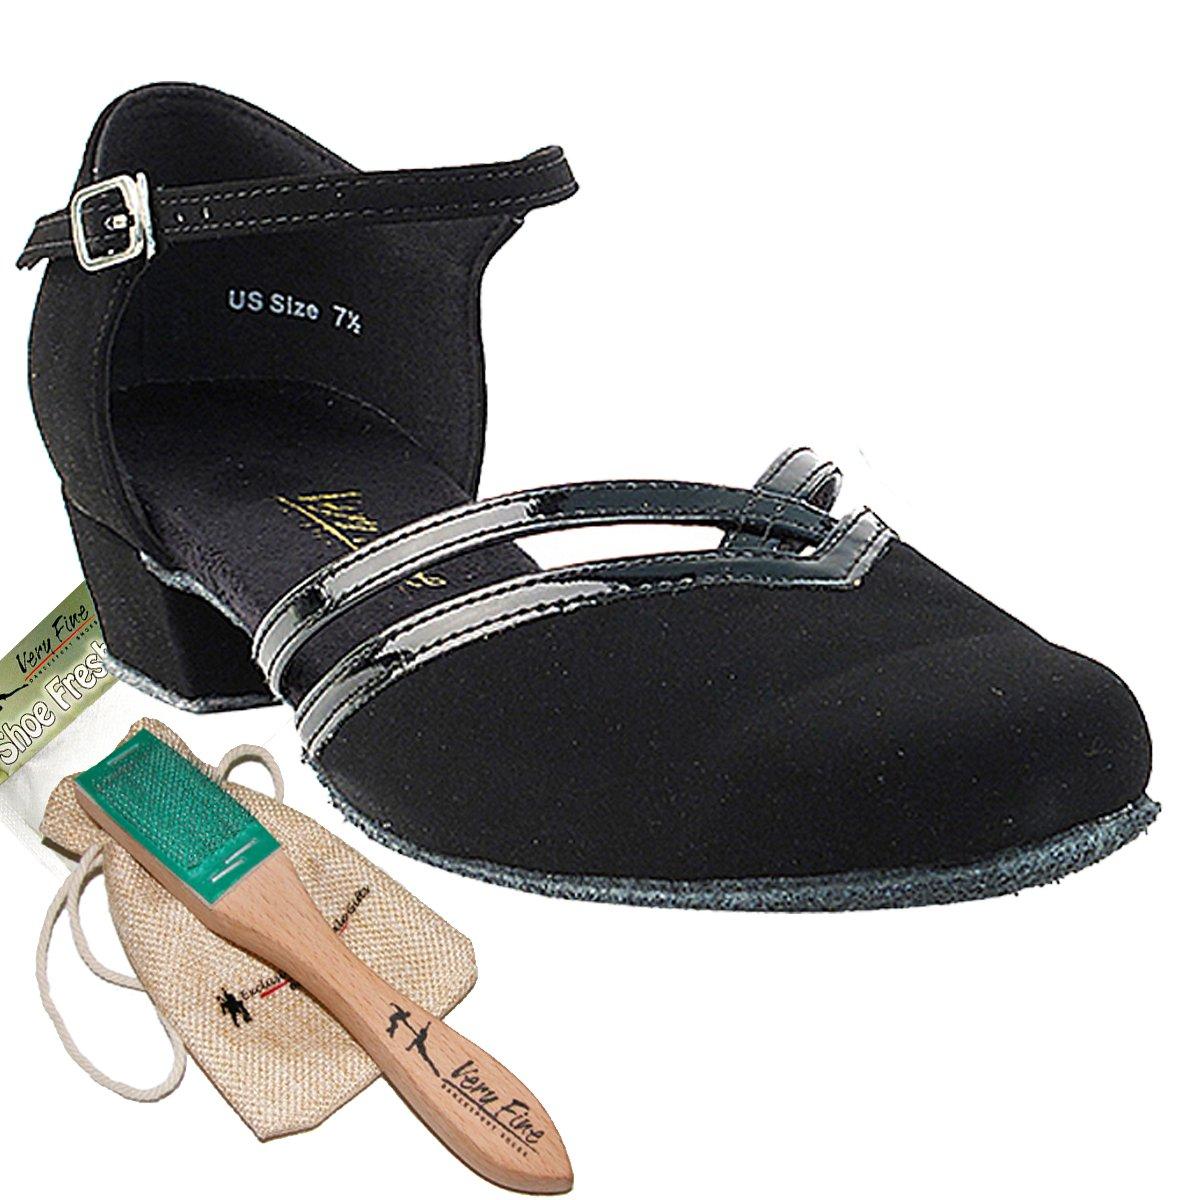 Womens Ballroom Dance Shoes Party Salsa Practice Shoes Black Nubuck 8881EB Comfortable - Very Fine 1'' Heel 10 M US [Bundle of 5]